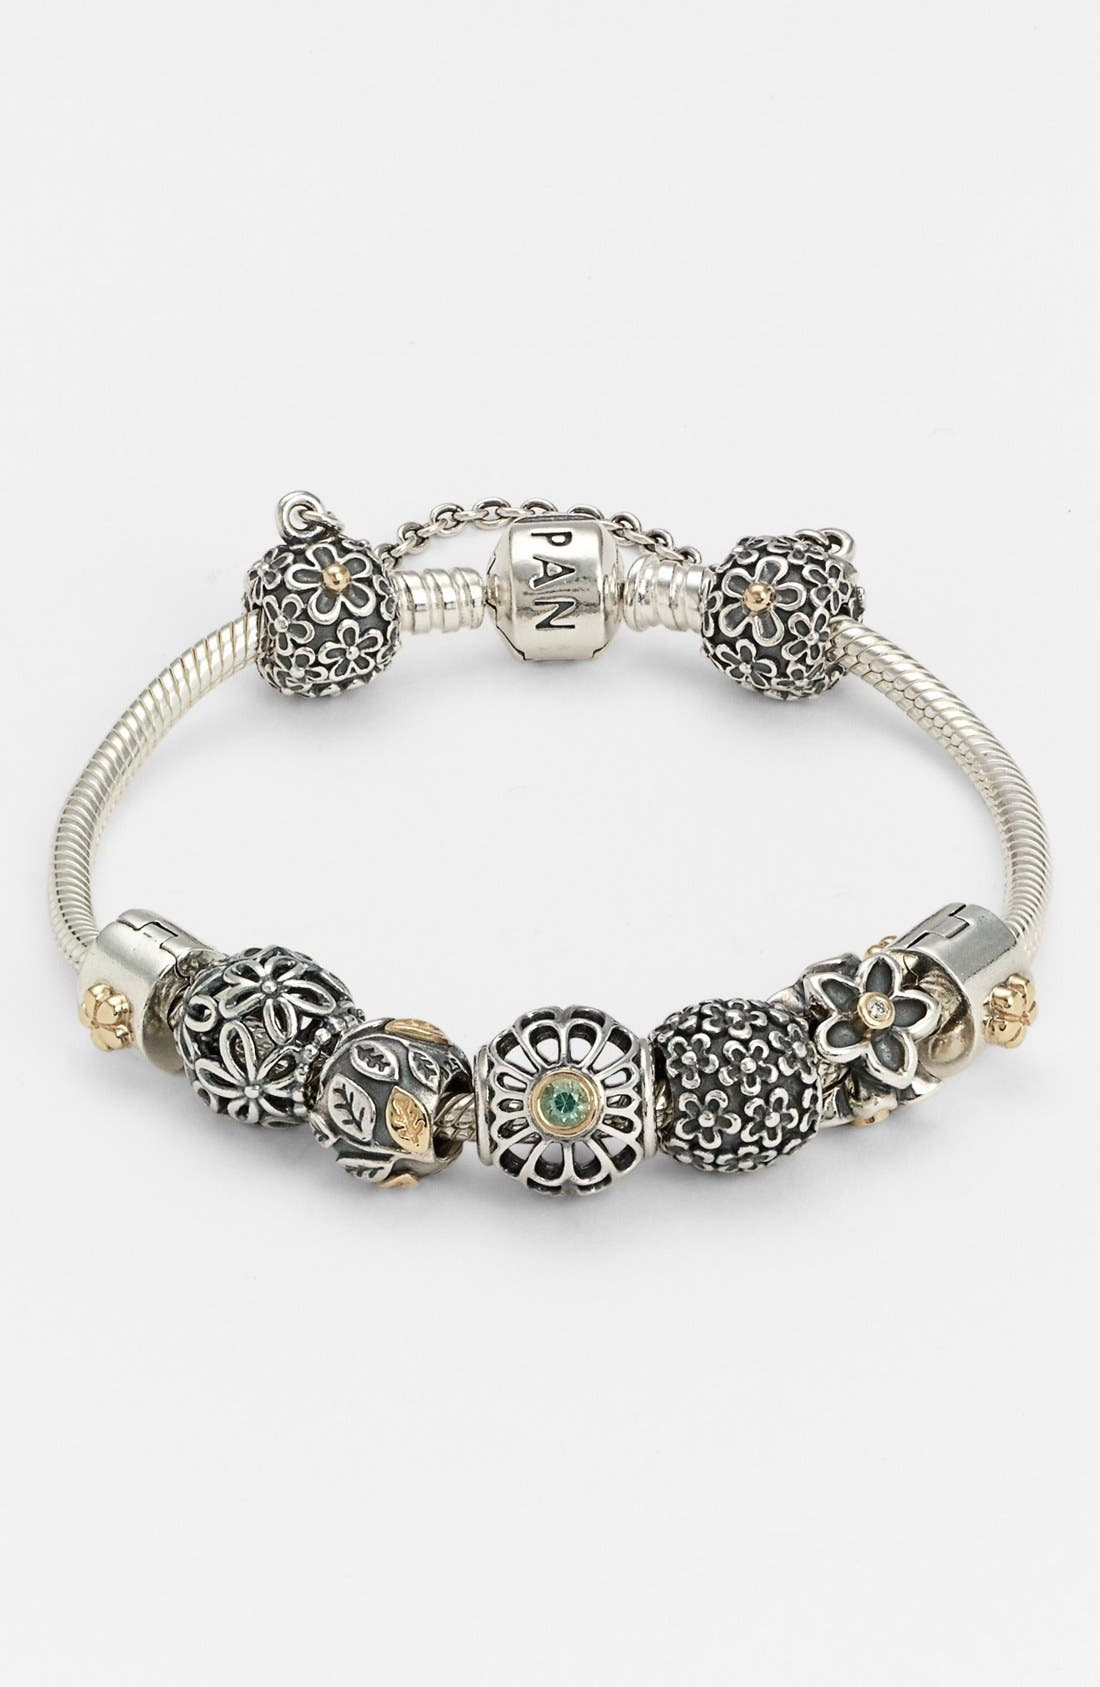 Main Image - PANDORA Bracelet & Charms